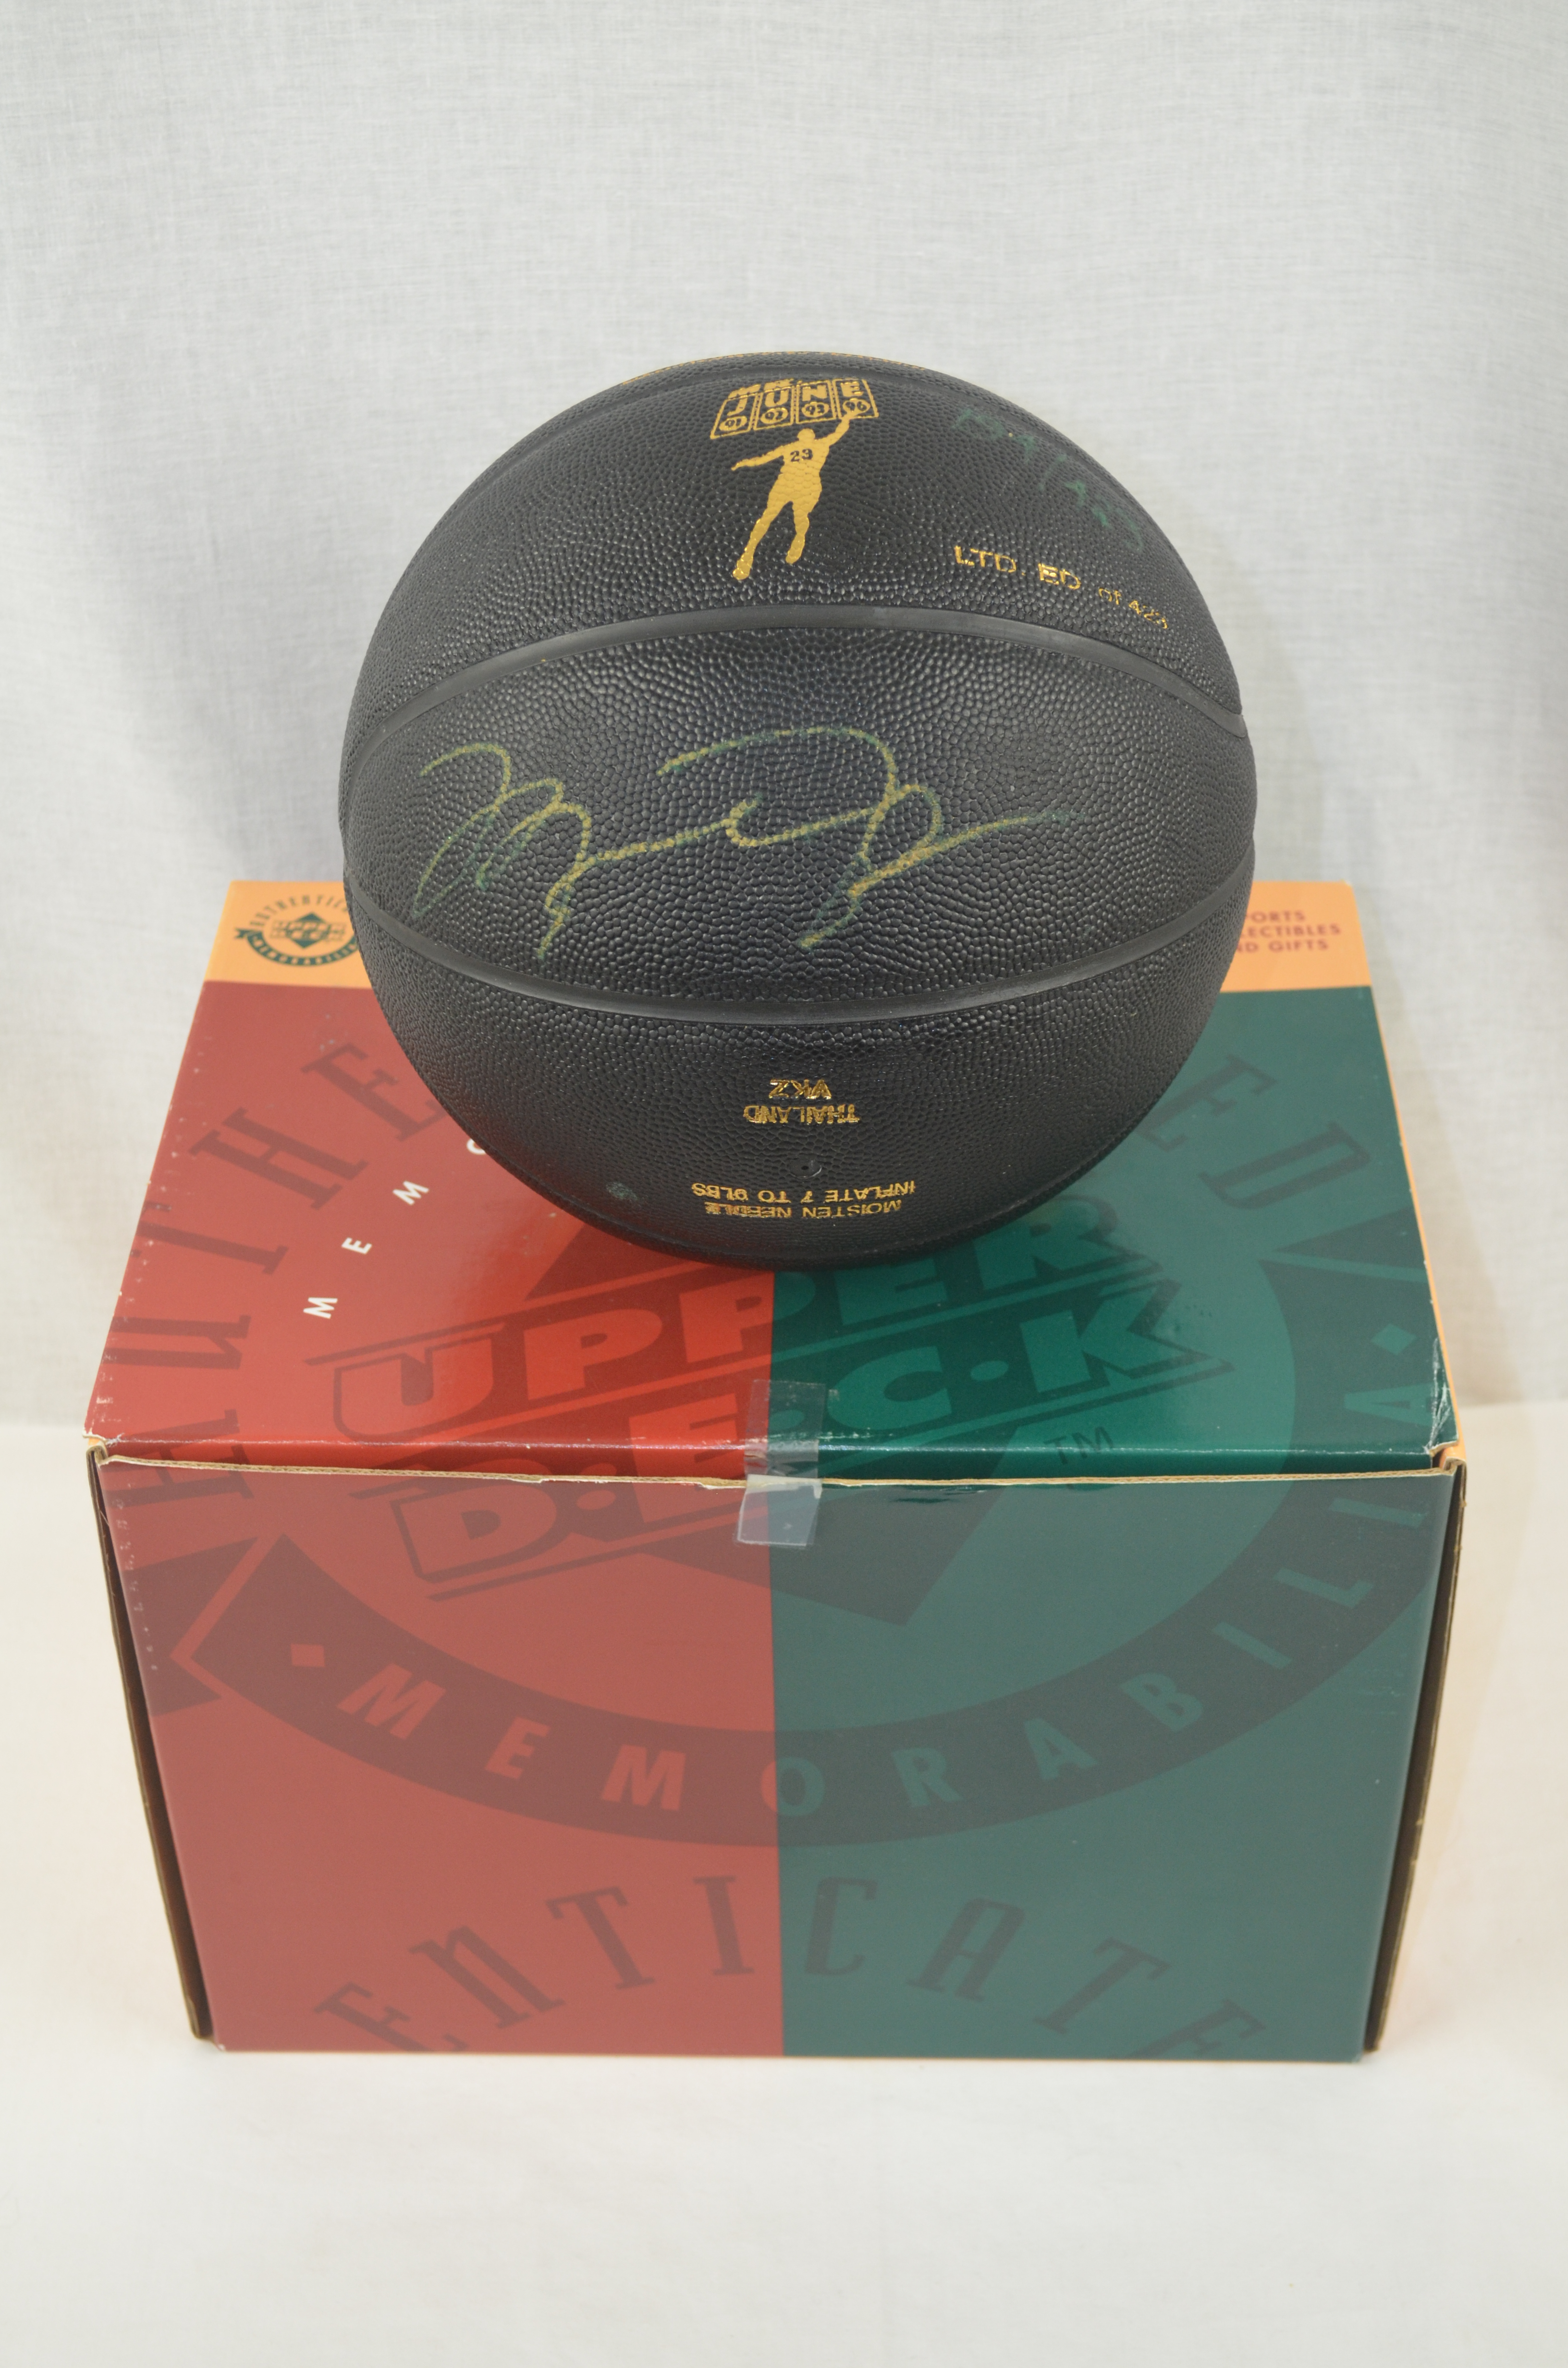 4ea282e99d7 Michael Jordan Autographed Mr. June Limited Edition UDA Basketball  193 423  ...